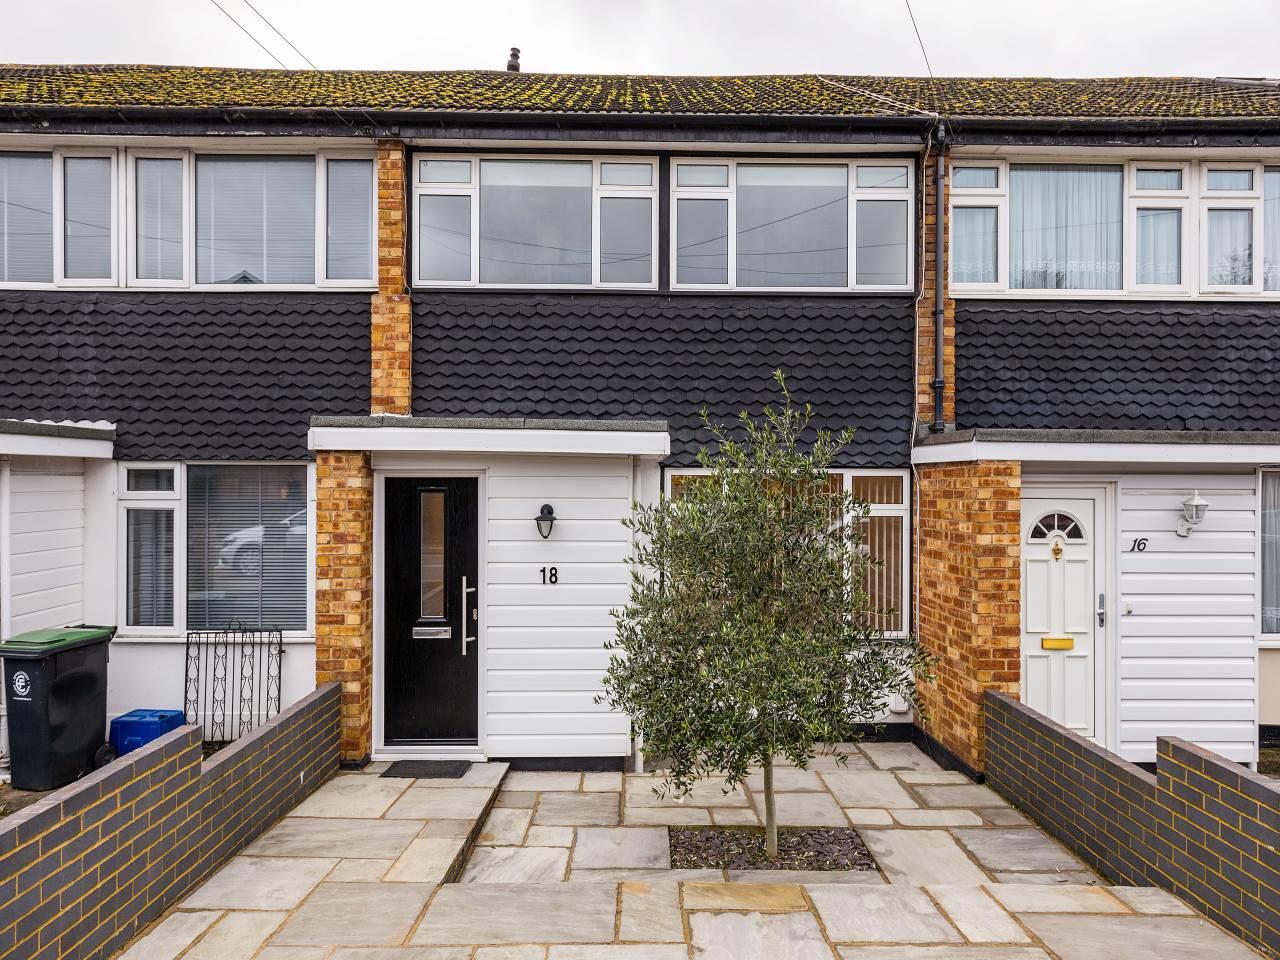 1 bed house to rent in Albert Road, Buckhurst Hill, IG9